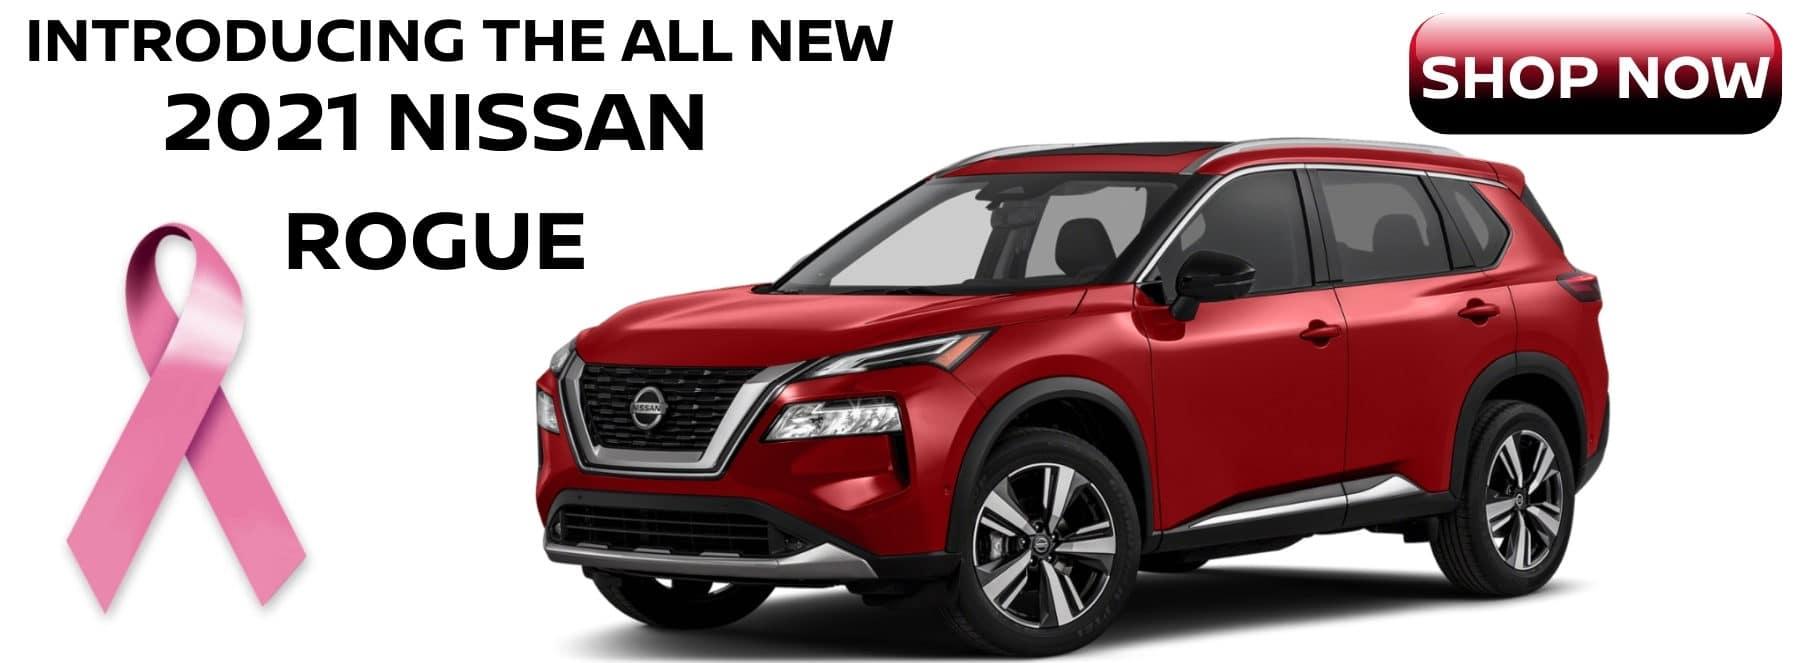 NissanRogue